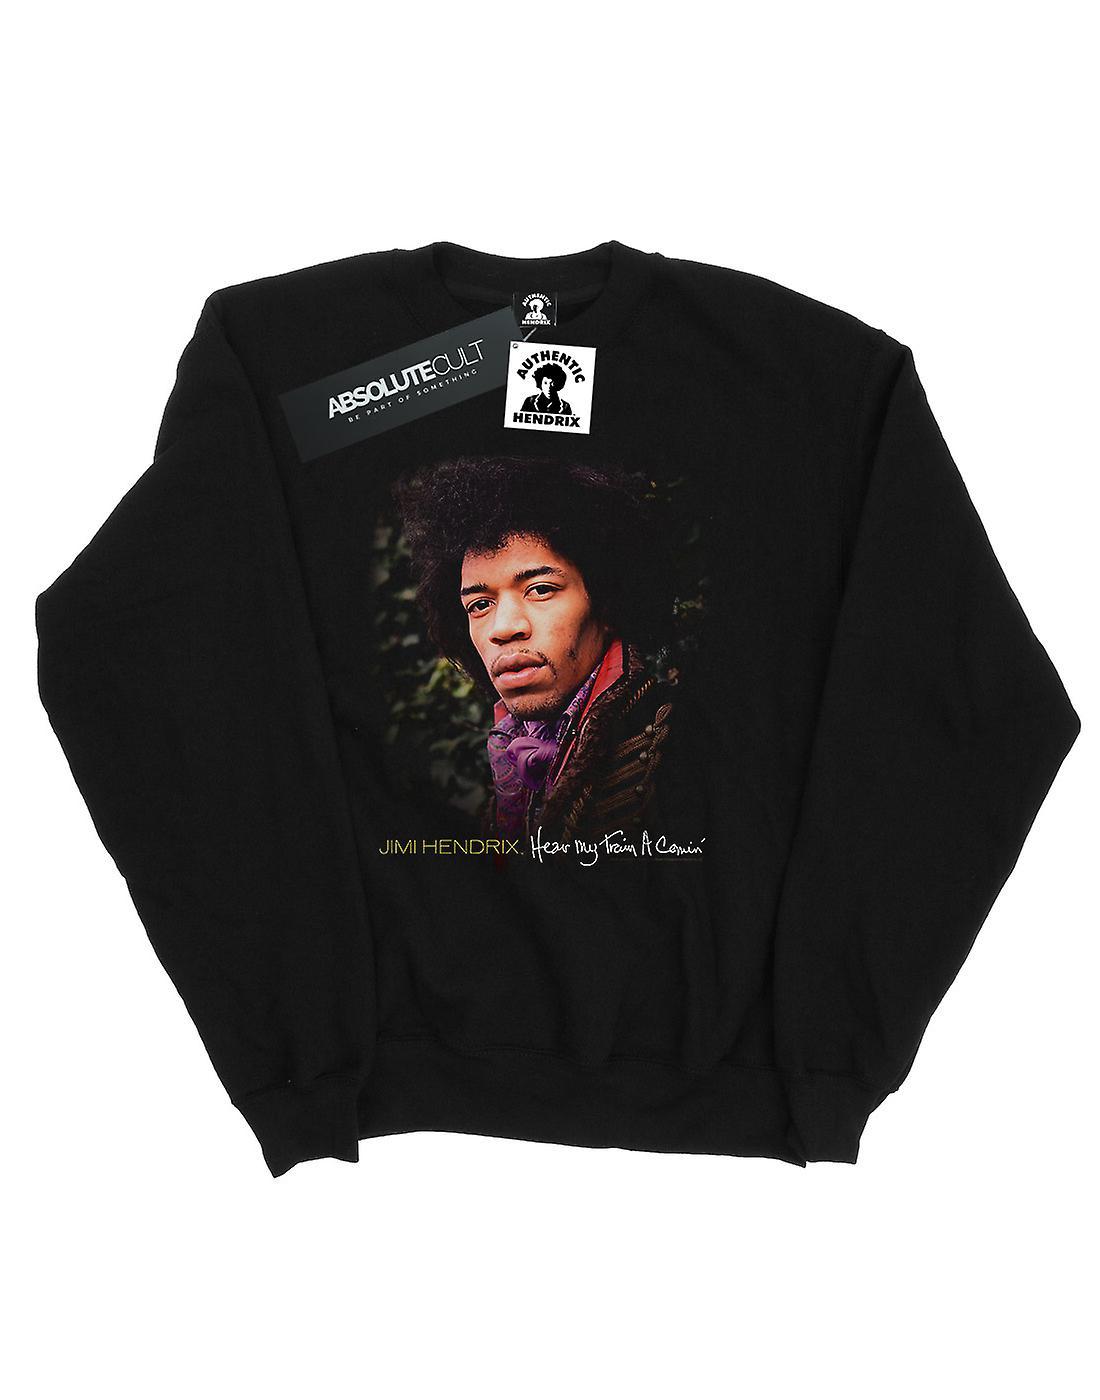 Jimi Hendrix Boys Train A' Comin Sweatshirt